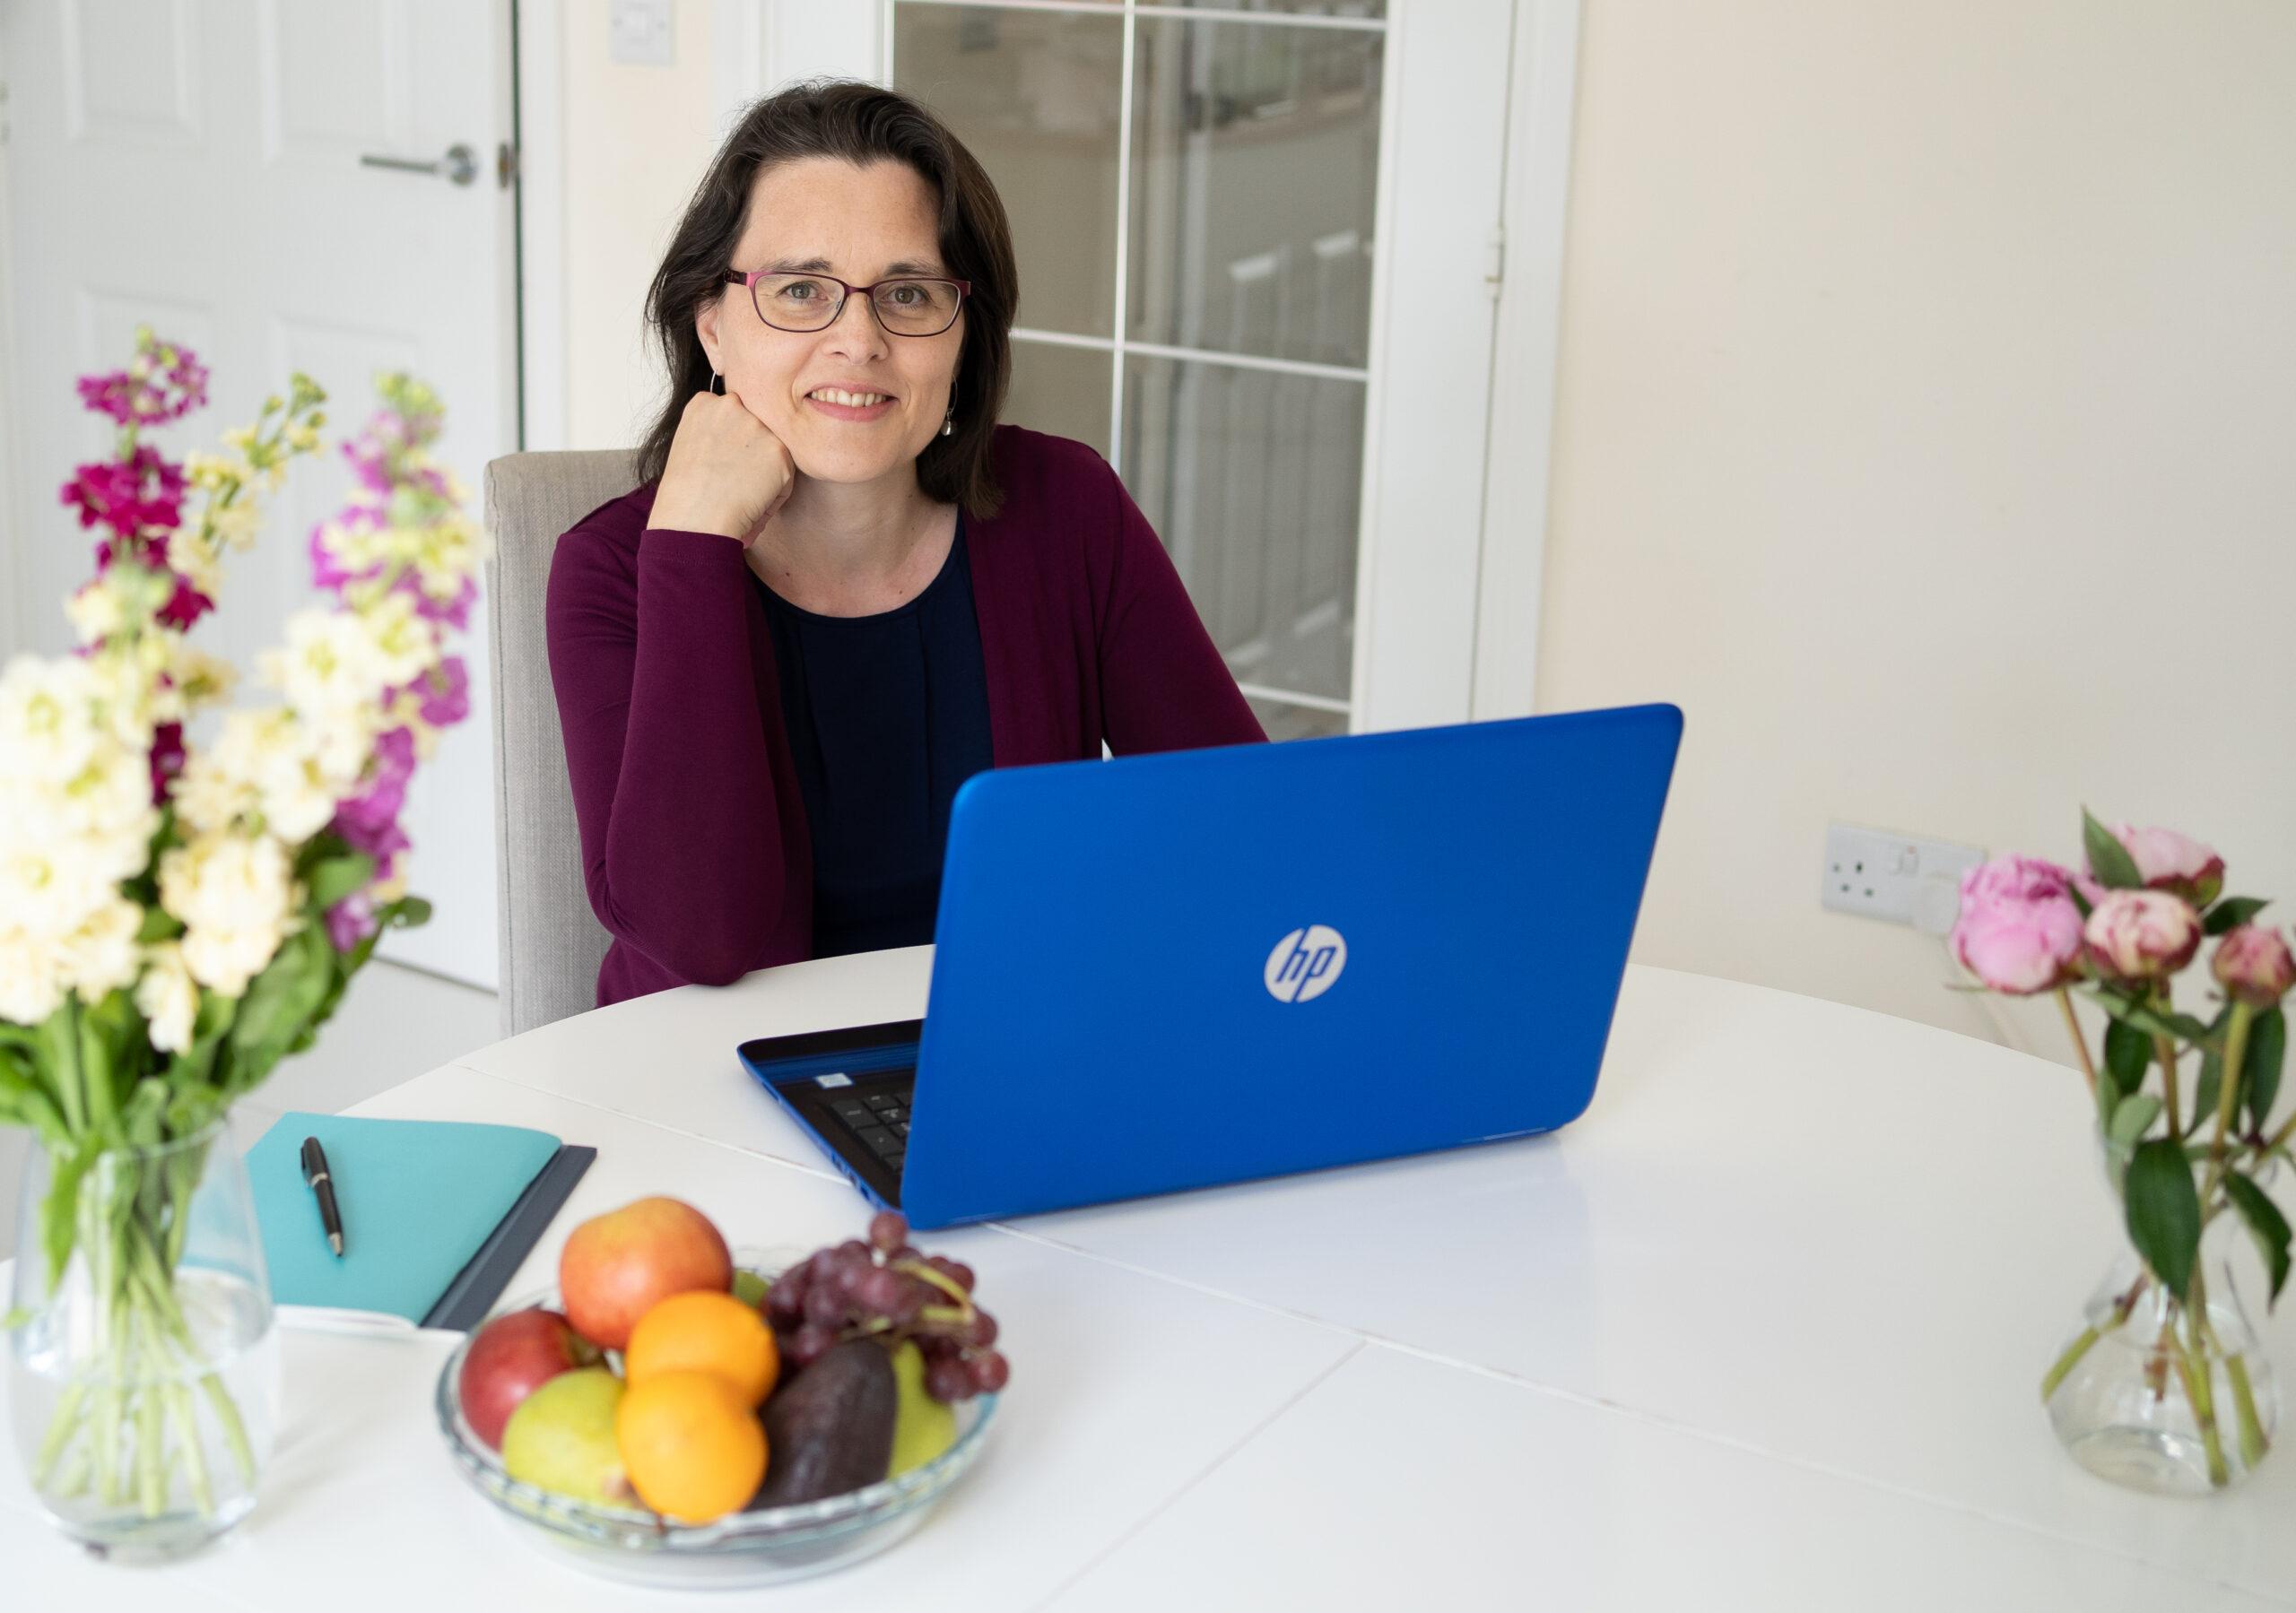 Sarah Roberts helps with autoimmune disease